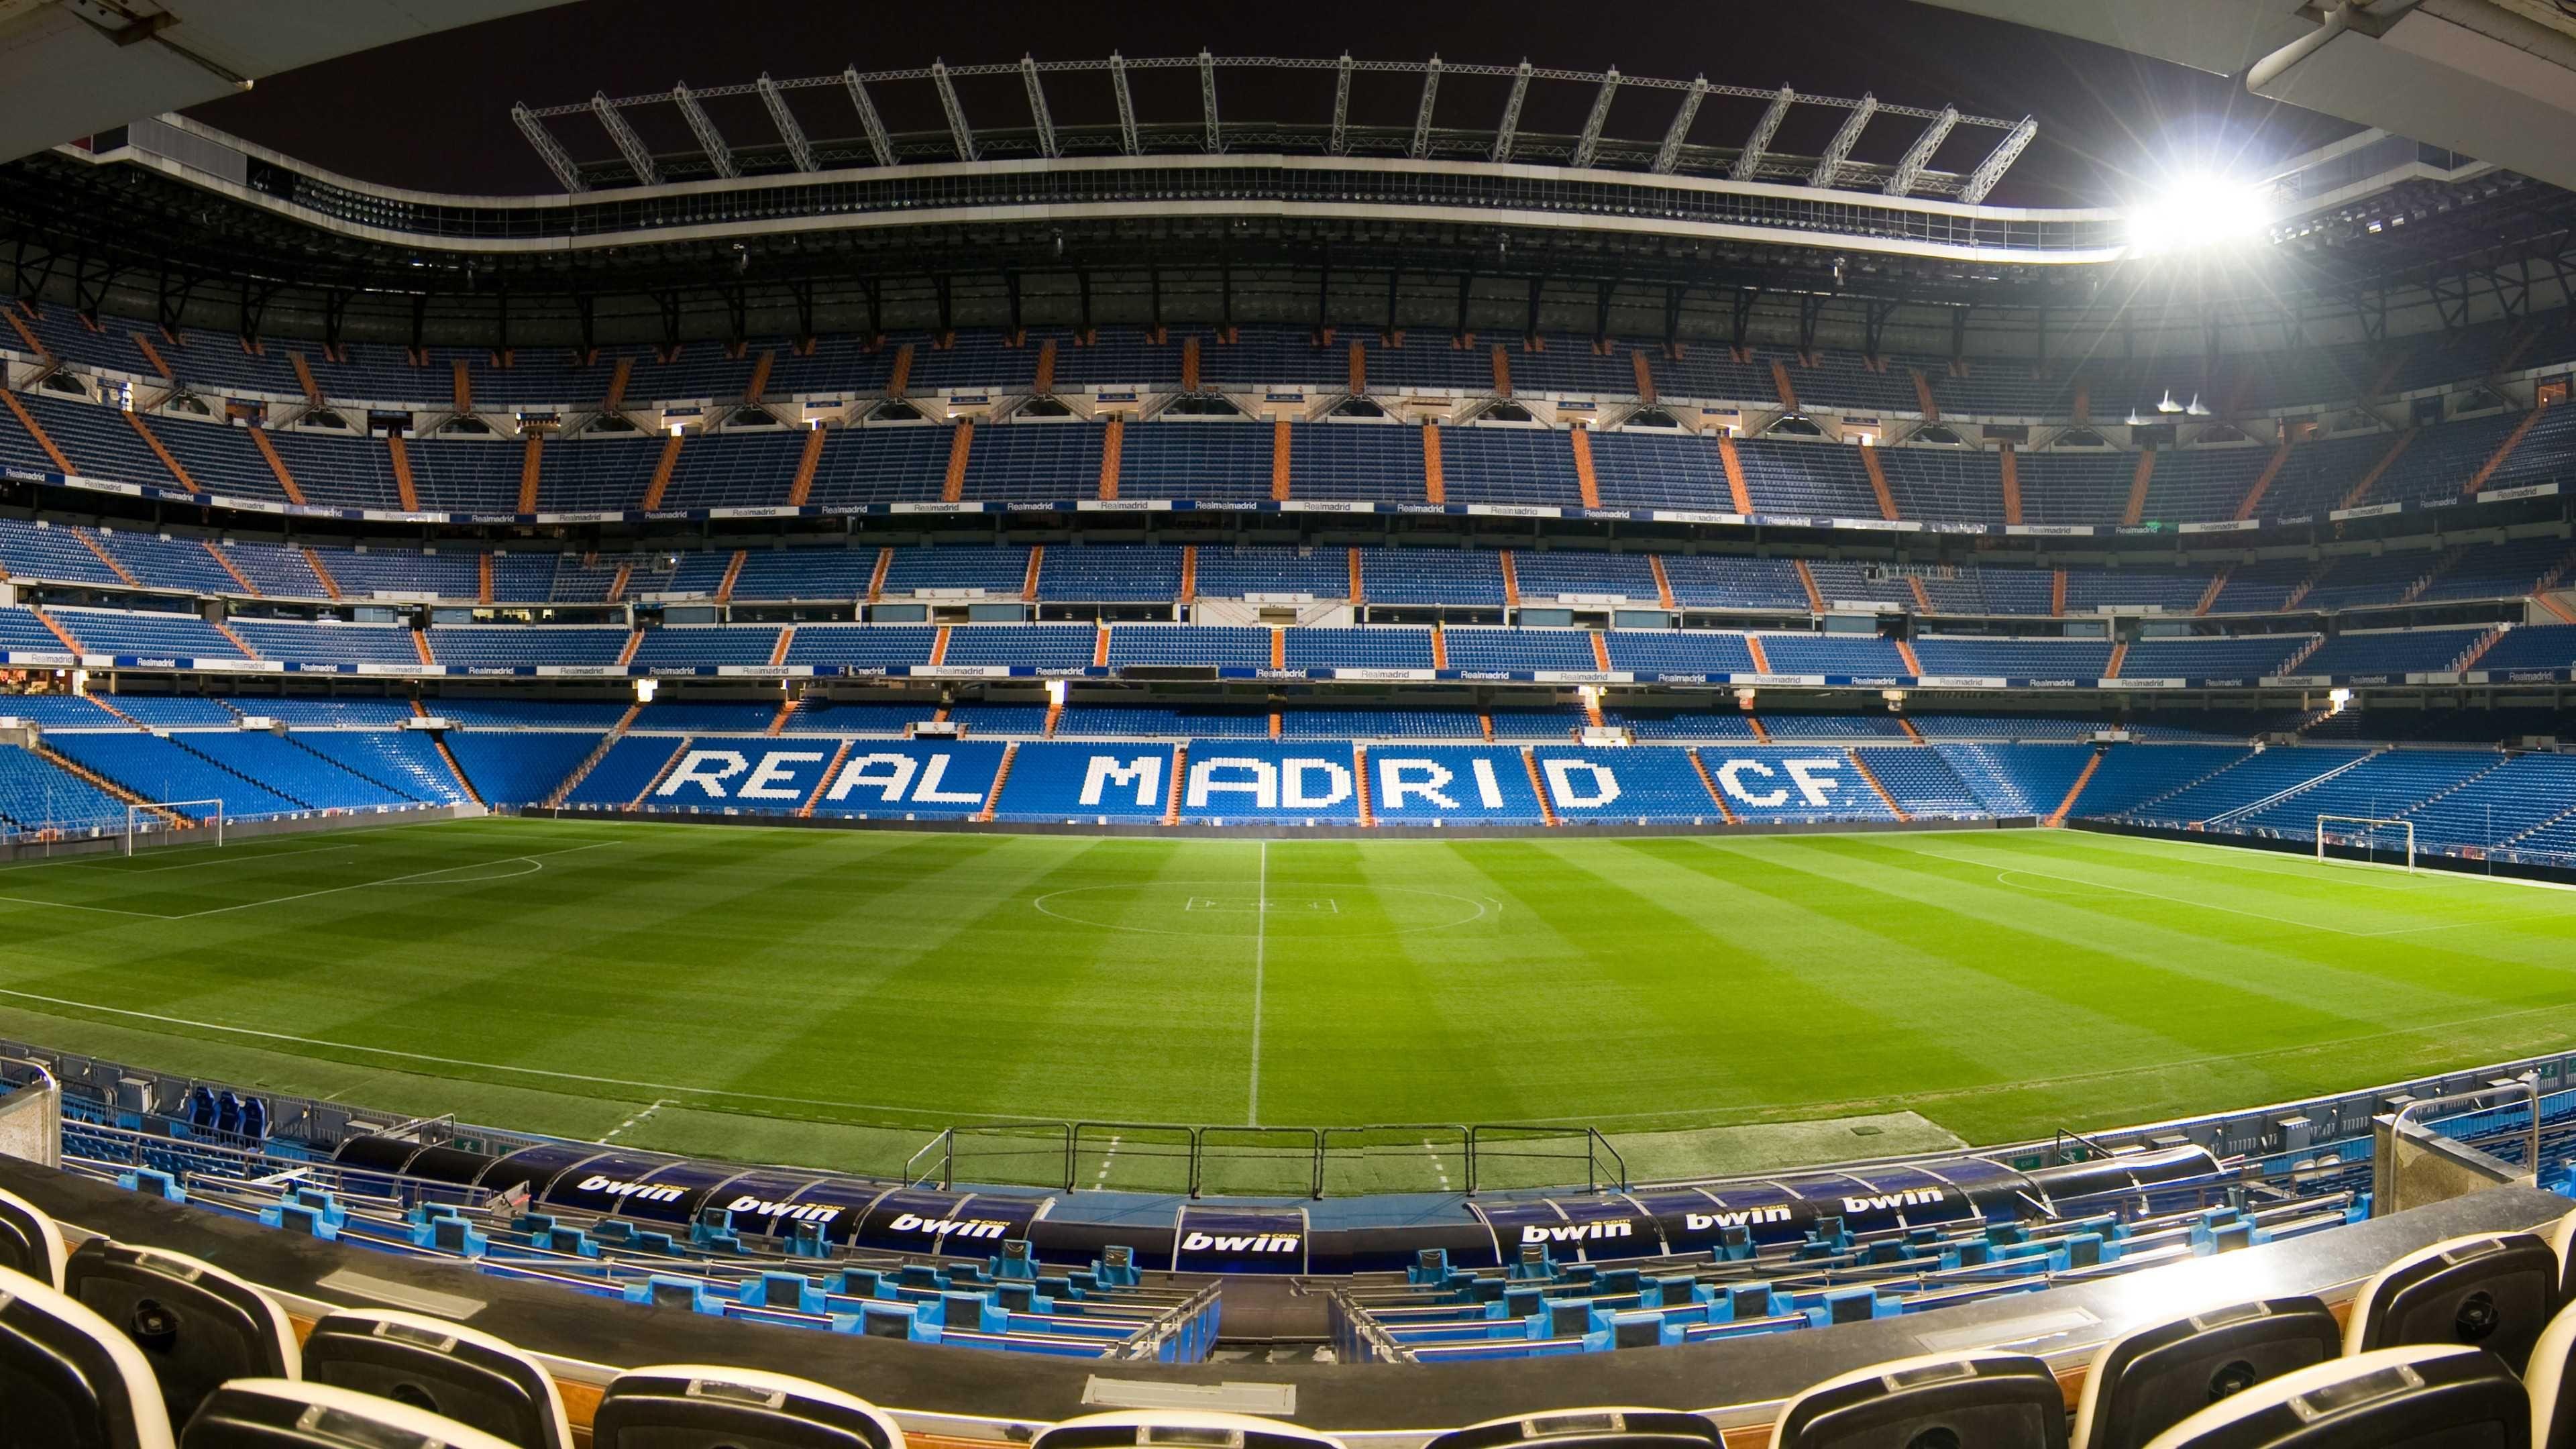 Real Madrid Stadium Wallpaper Hd Background Desktop High Resolution Of Iphone Pics Real Madrid Wallpapers Madrid Wallpaper Real Madrid